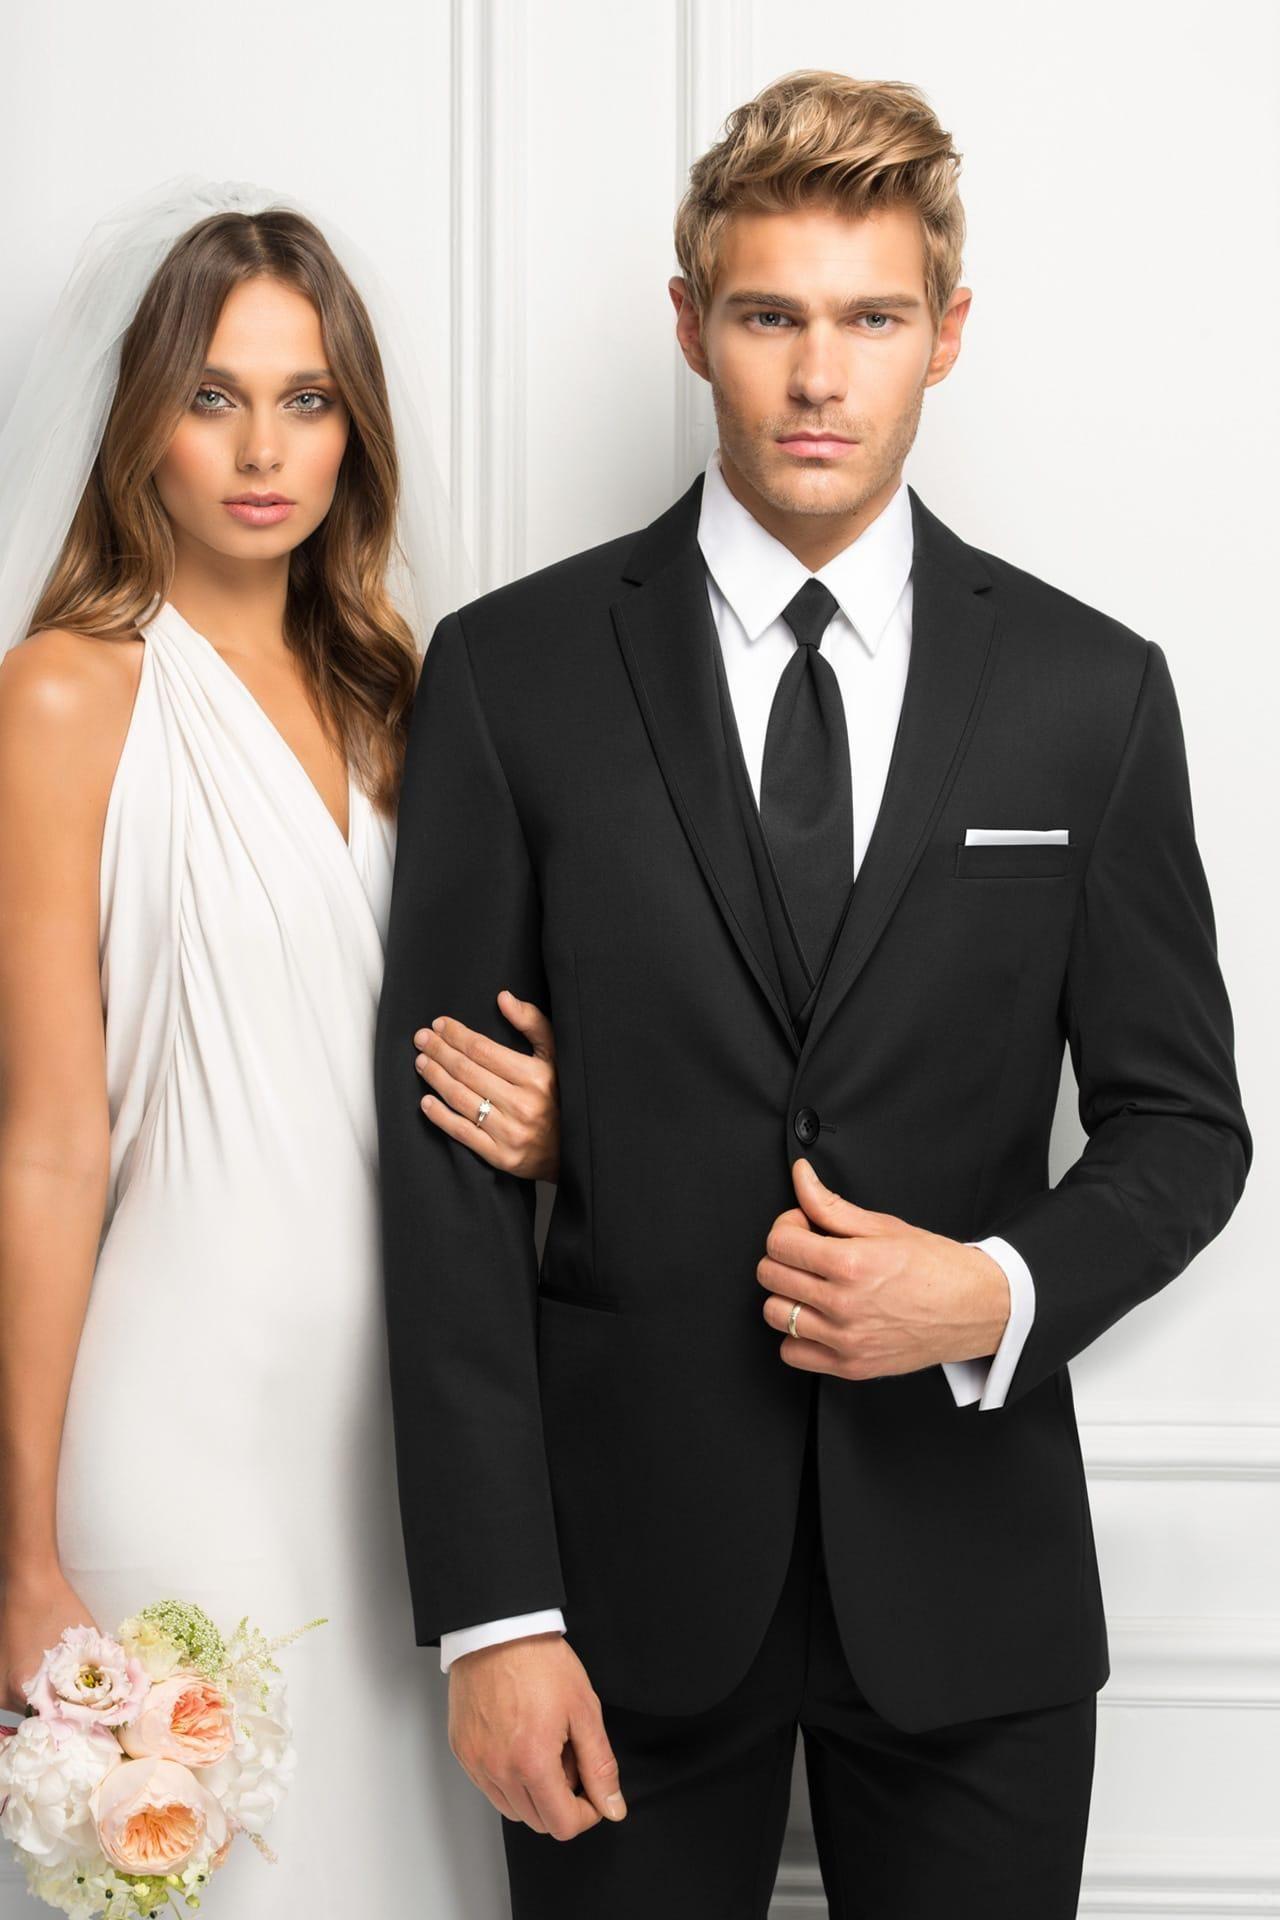 Michael Kors Ultra Slim Sterling Wedding Suit Ultra Slim Fit Suit ...